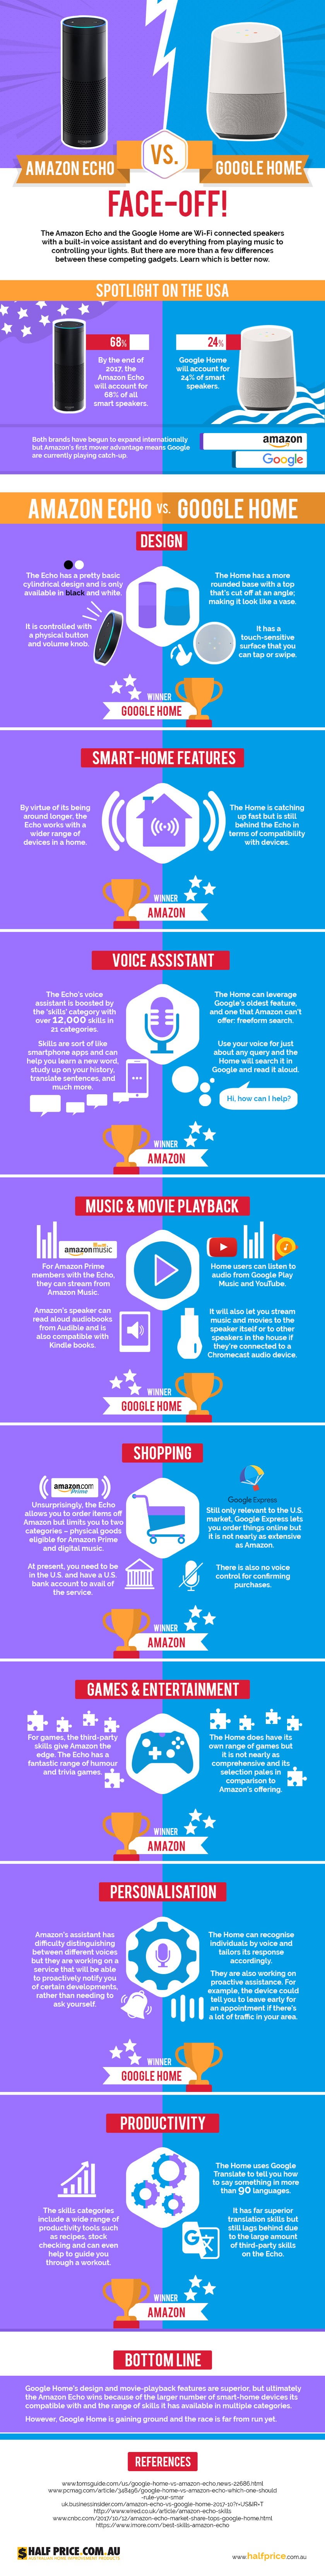 Comparison of smart speakers: Amazon Echo vs. Google Home #infographic